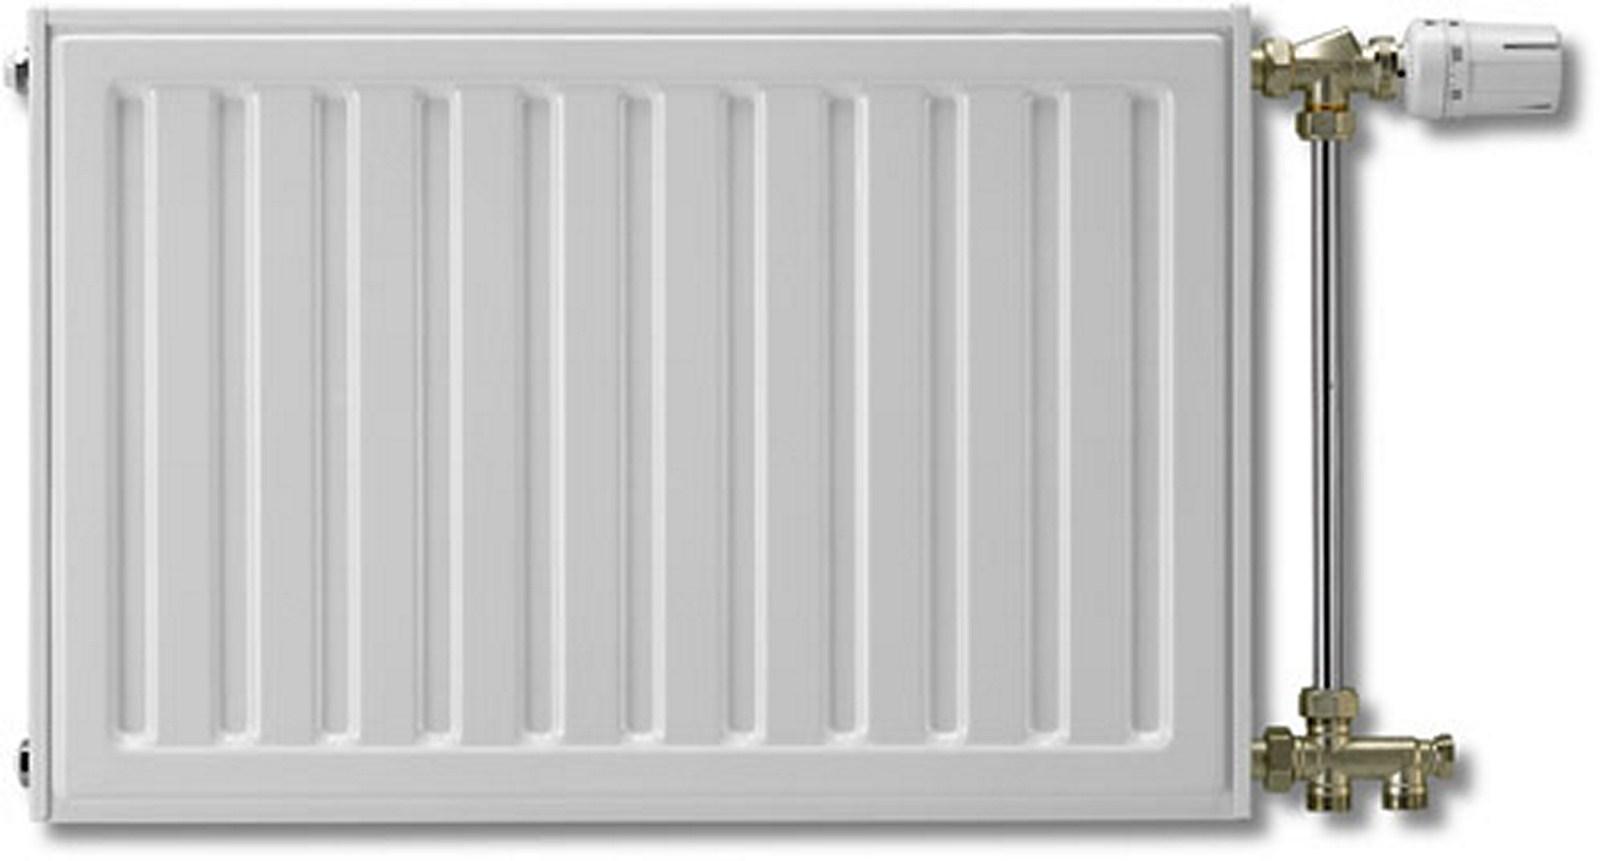 chauffage radiateur panneaux radson radiateur compact habill ep65 mm 351w 70 56 ttc. Black Bedroom Furniture Sets. Home Design Ideas